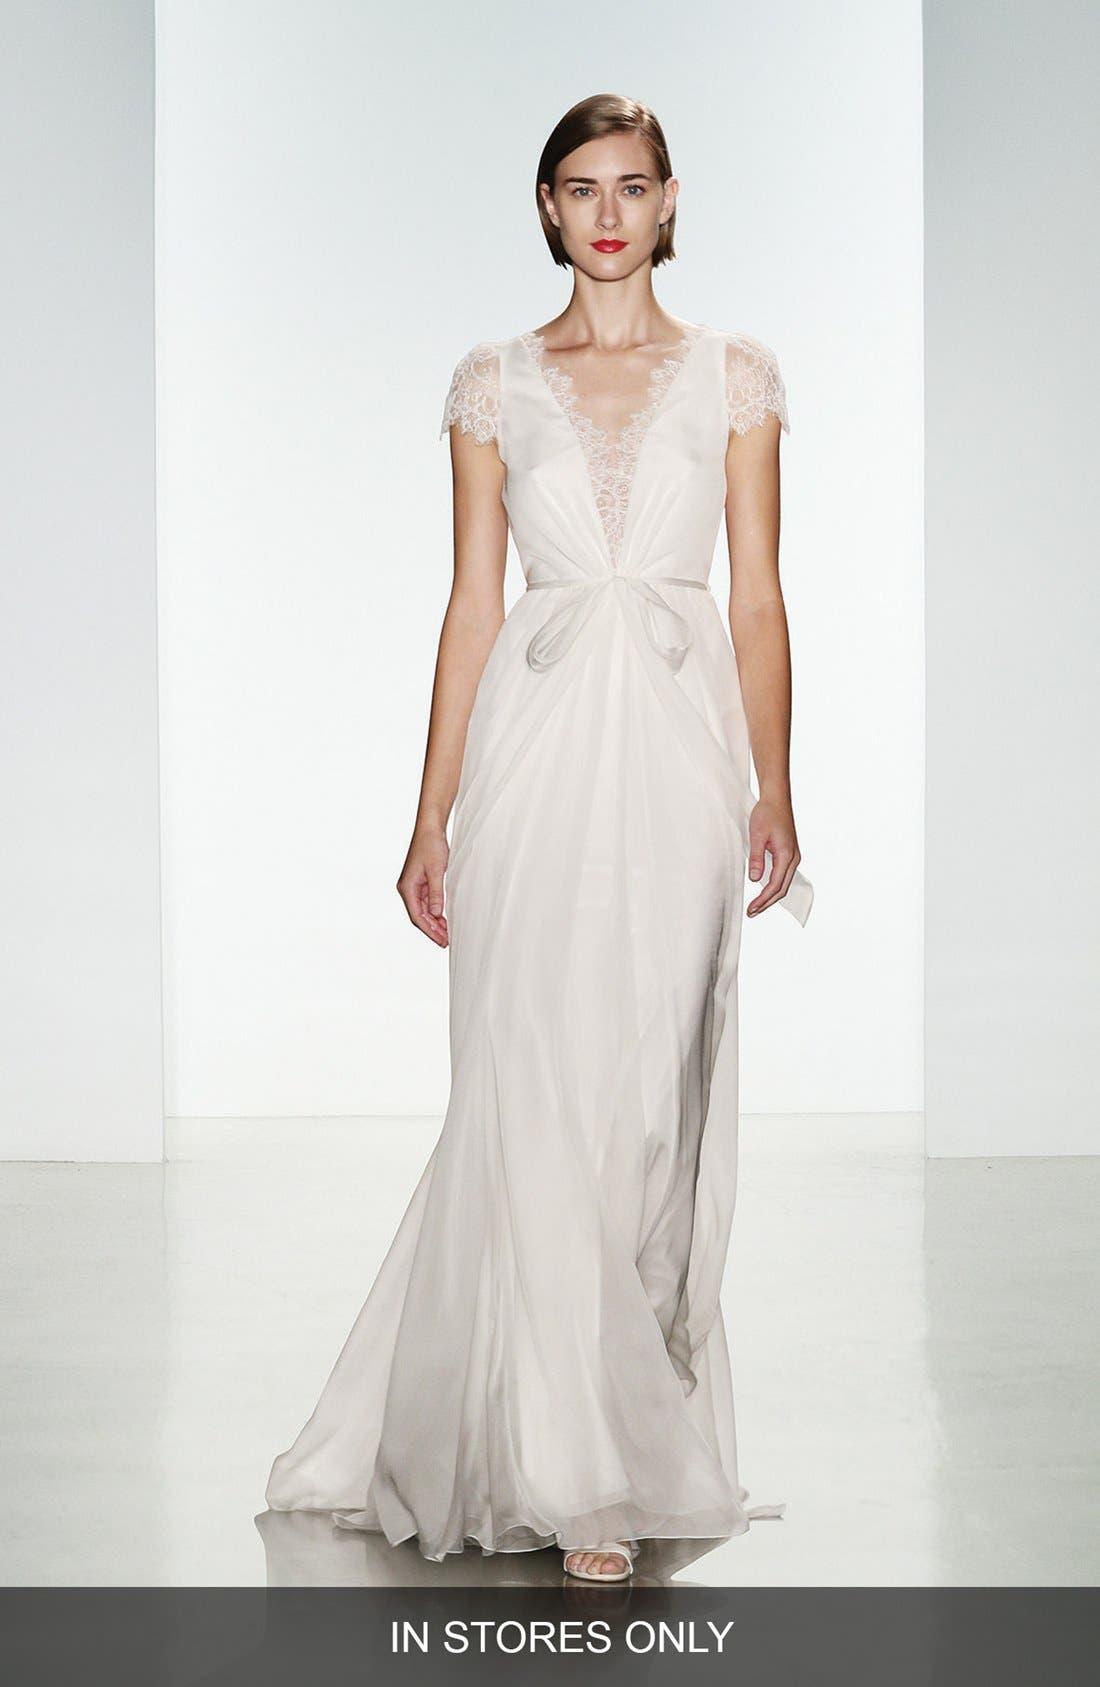 Lainee Silk Chiffon & Lace Cap Sleeve Gown,                             Main thumbnail 1, color,                             900